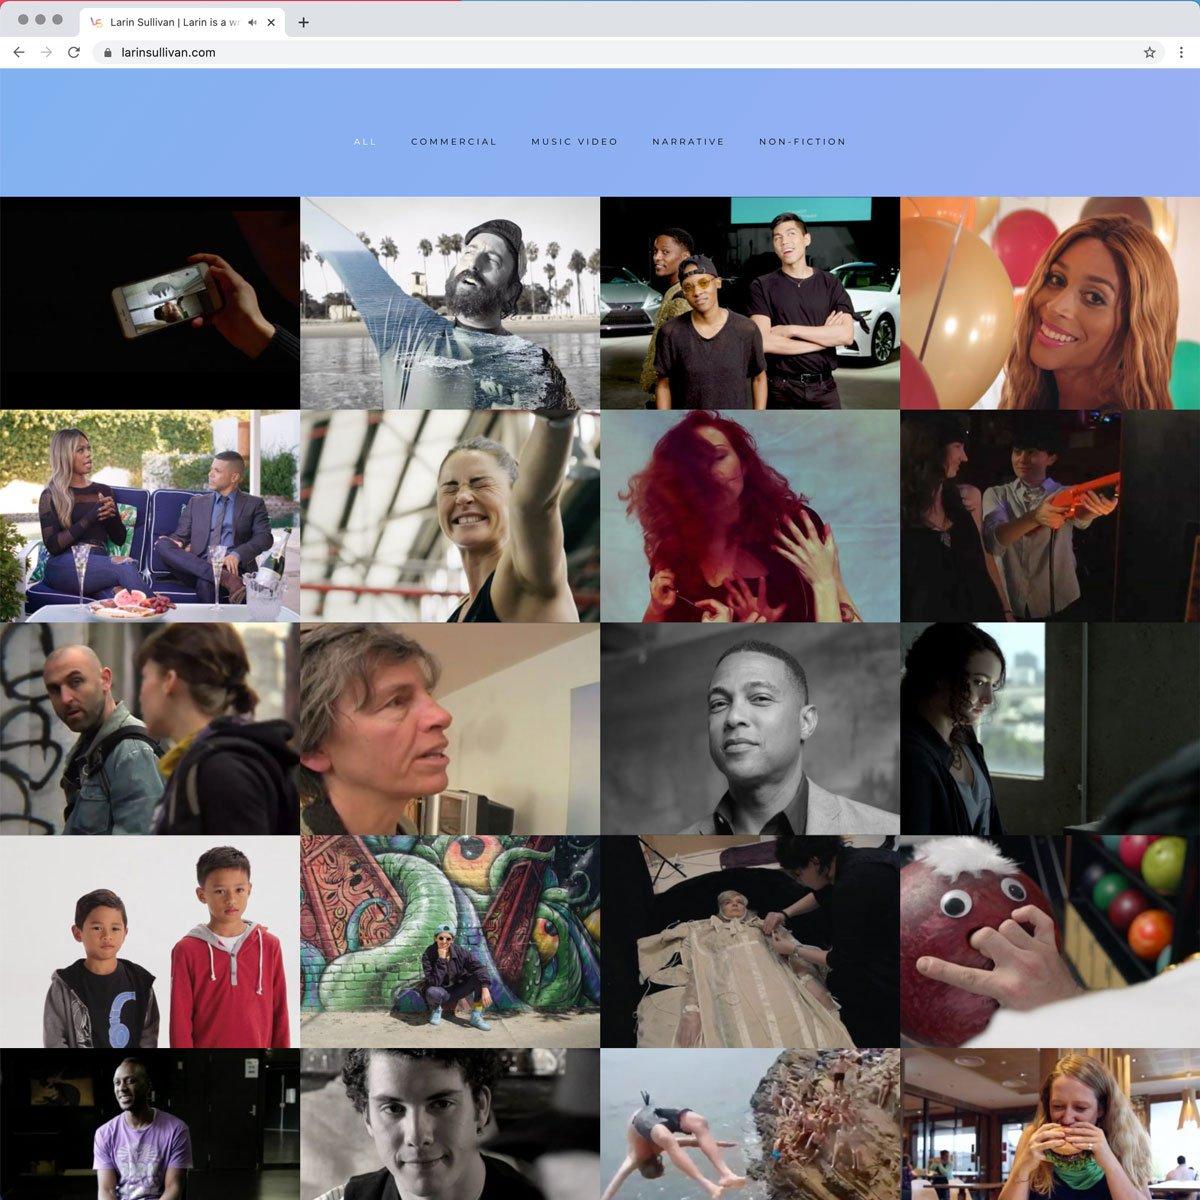 Larin Sullivan Web Design - Desktop